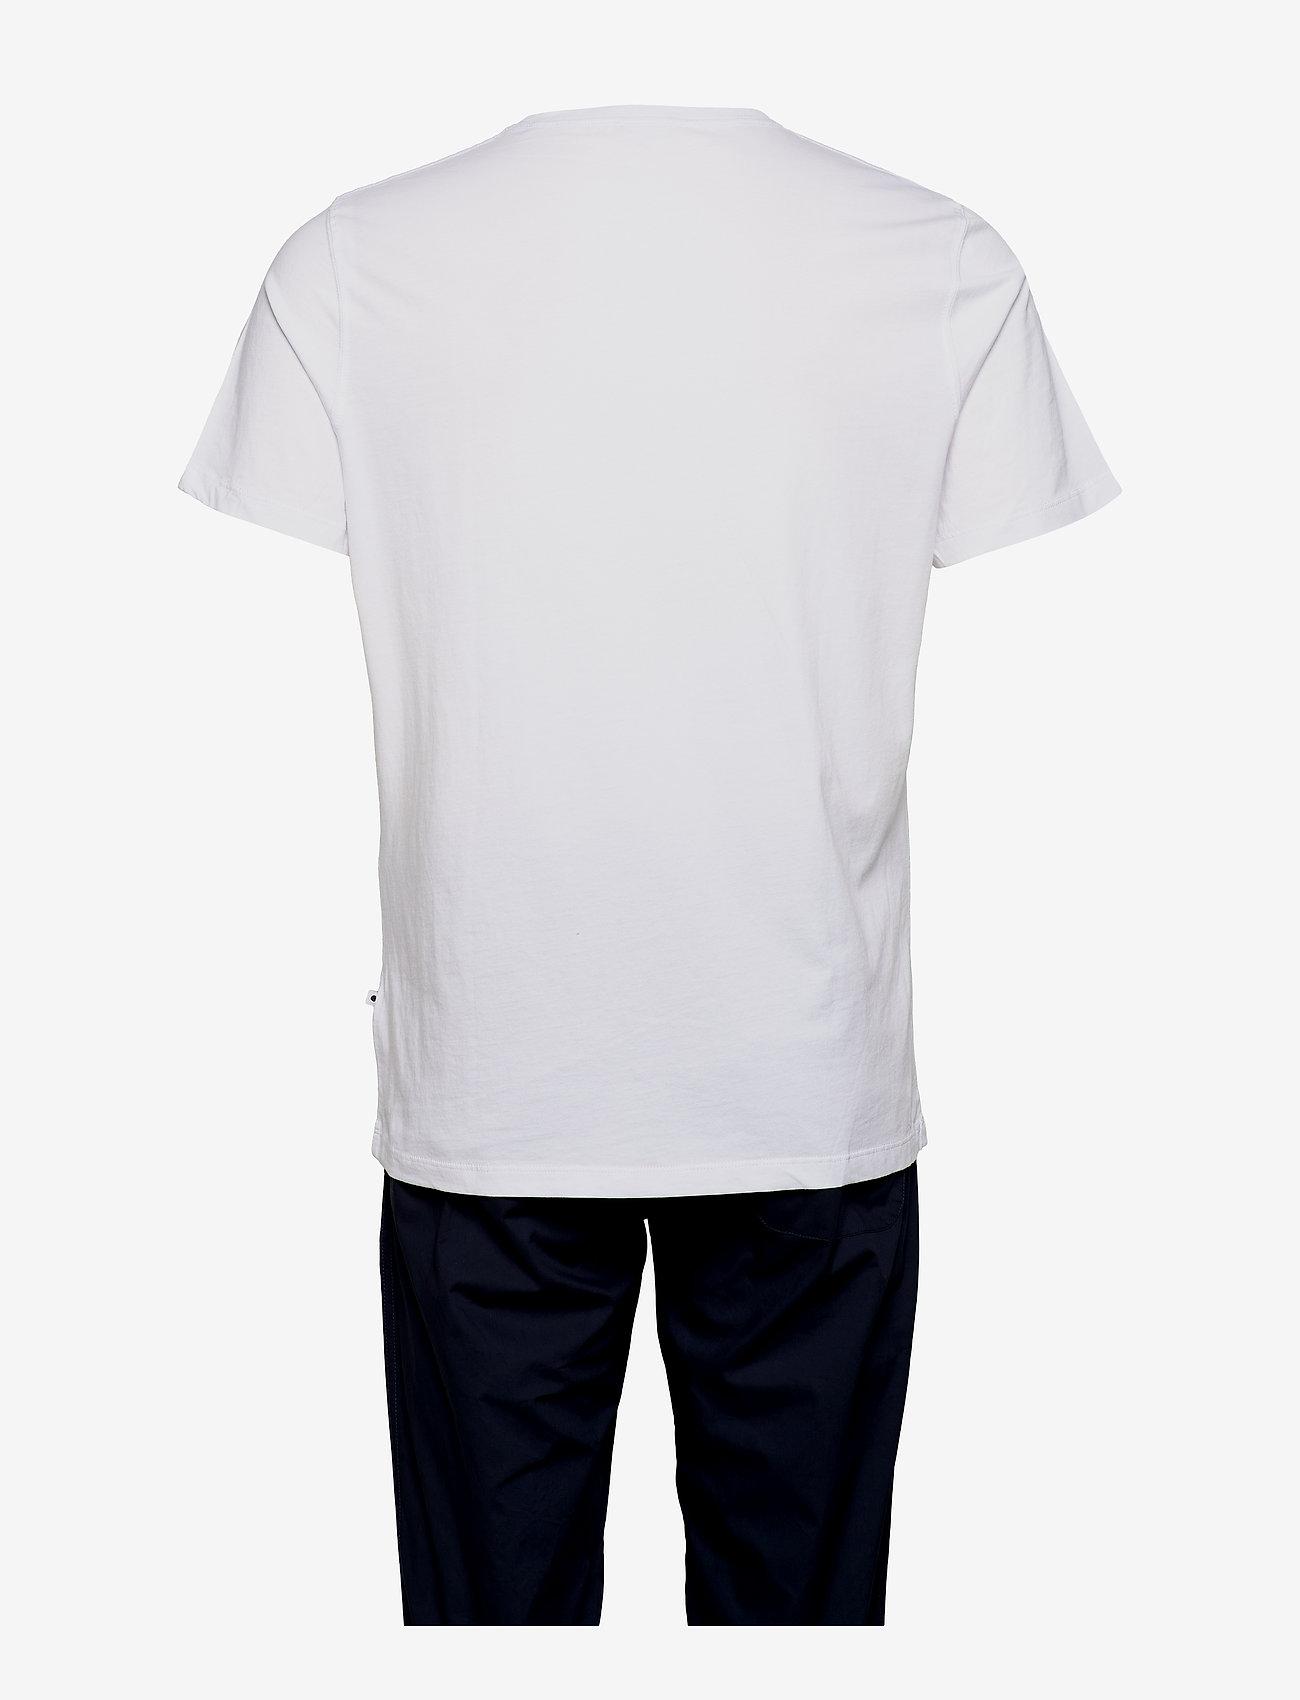 NN07 - Sleepwell Kit 5965 - pyjamas - navy blue - 1